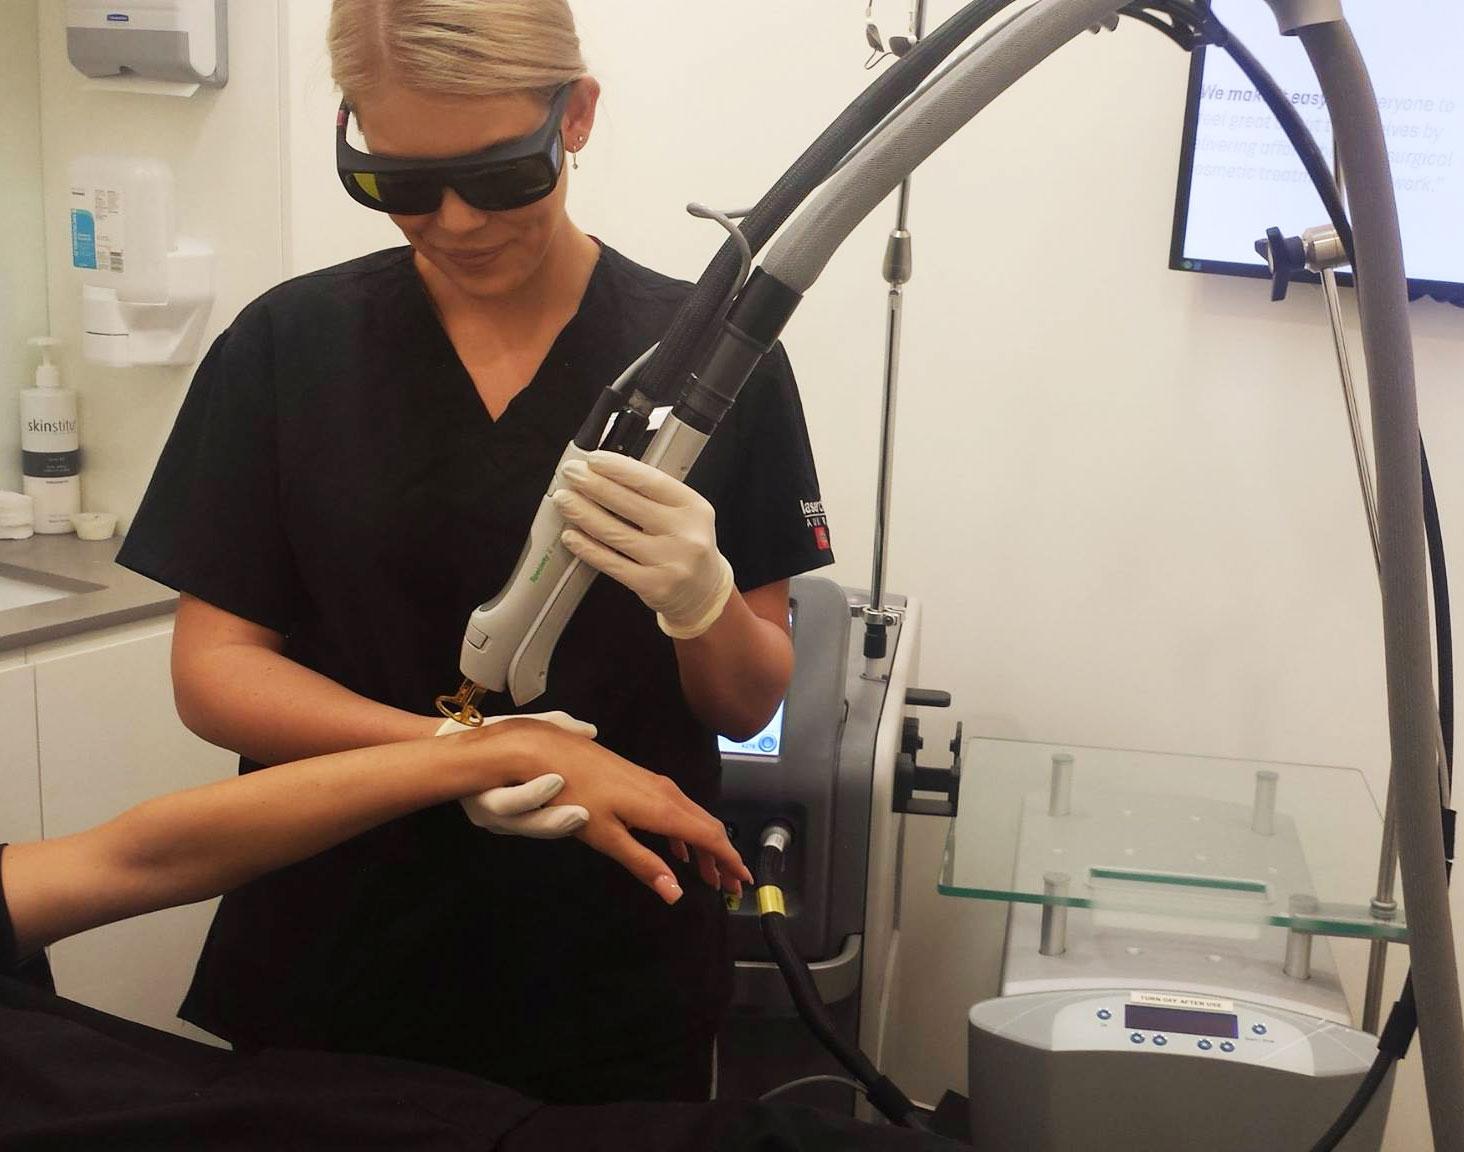 Beauty Roadtest : Laser Clinics Australia - HerCanberra com au